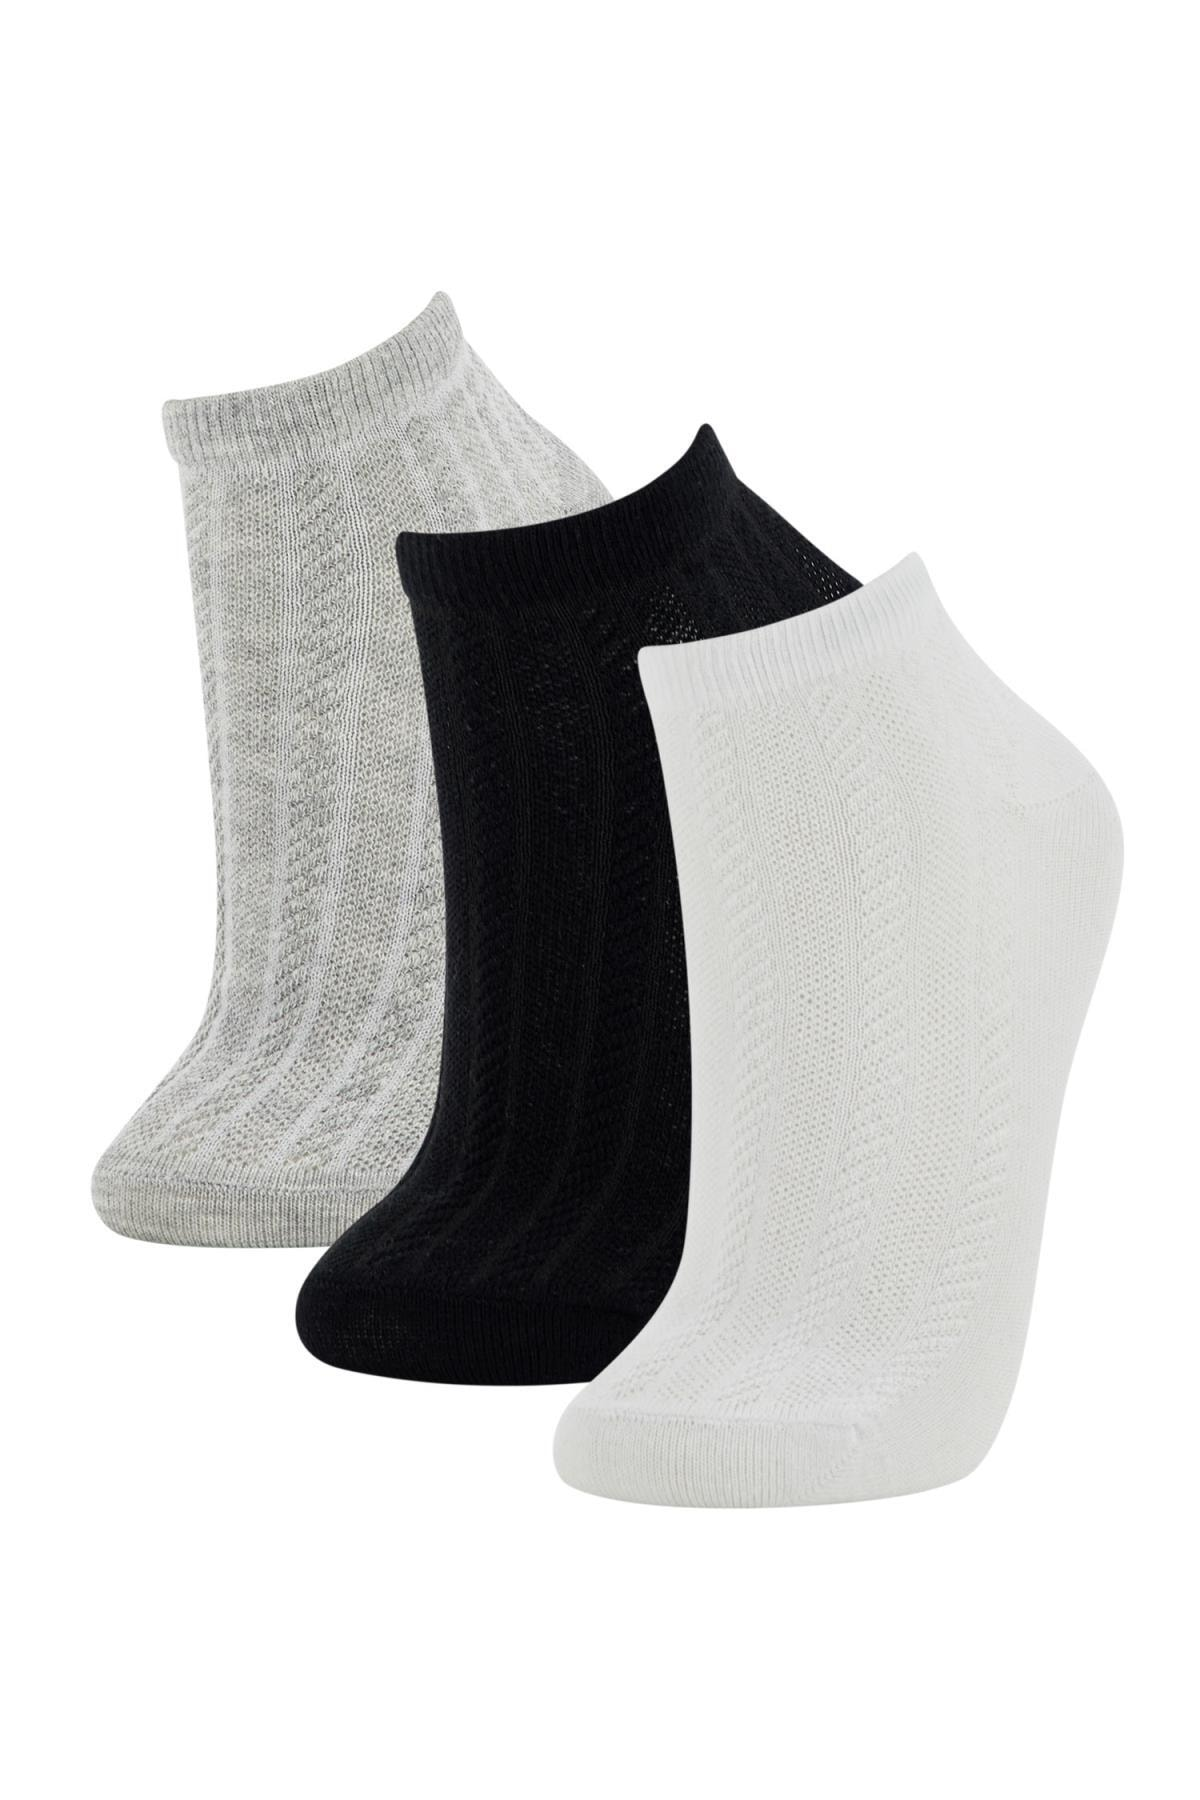 DeFacto Kadın Patik Çorap 3'Lü T7394AZ21SP